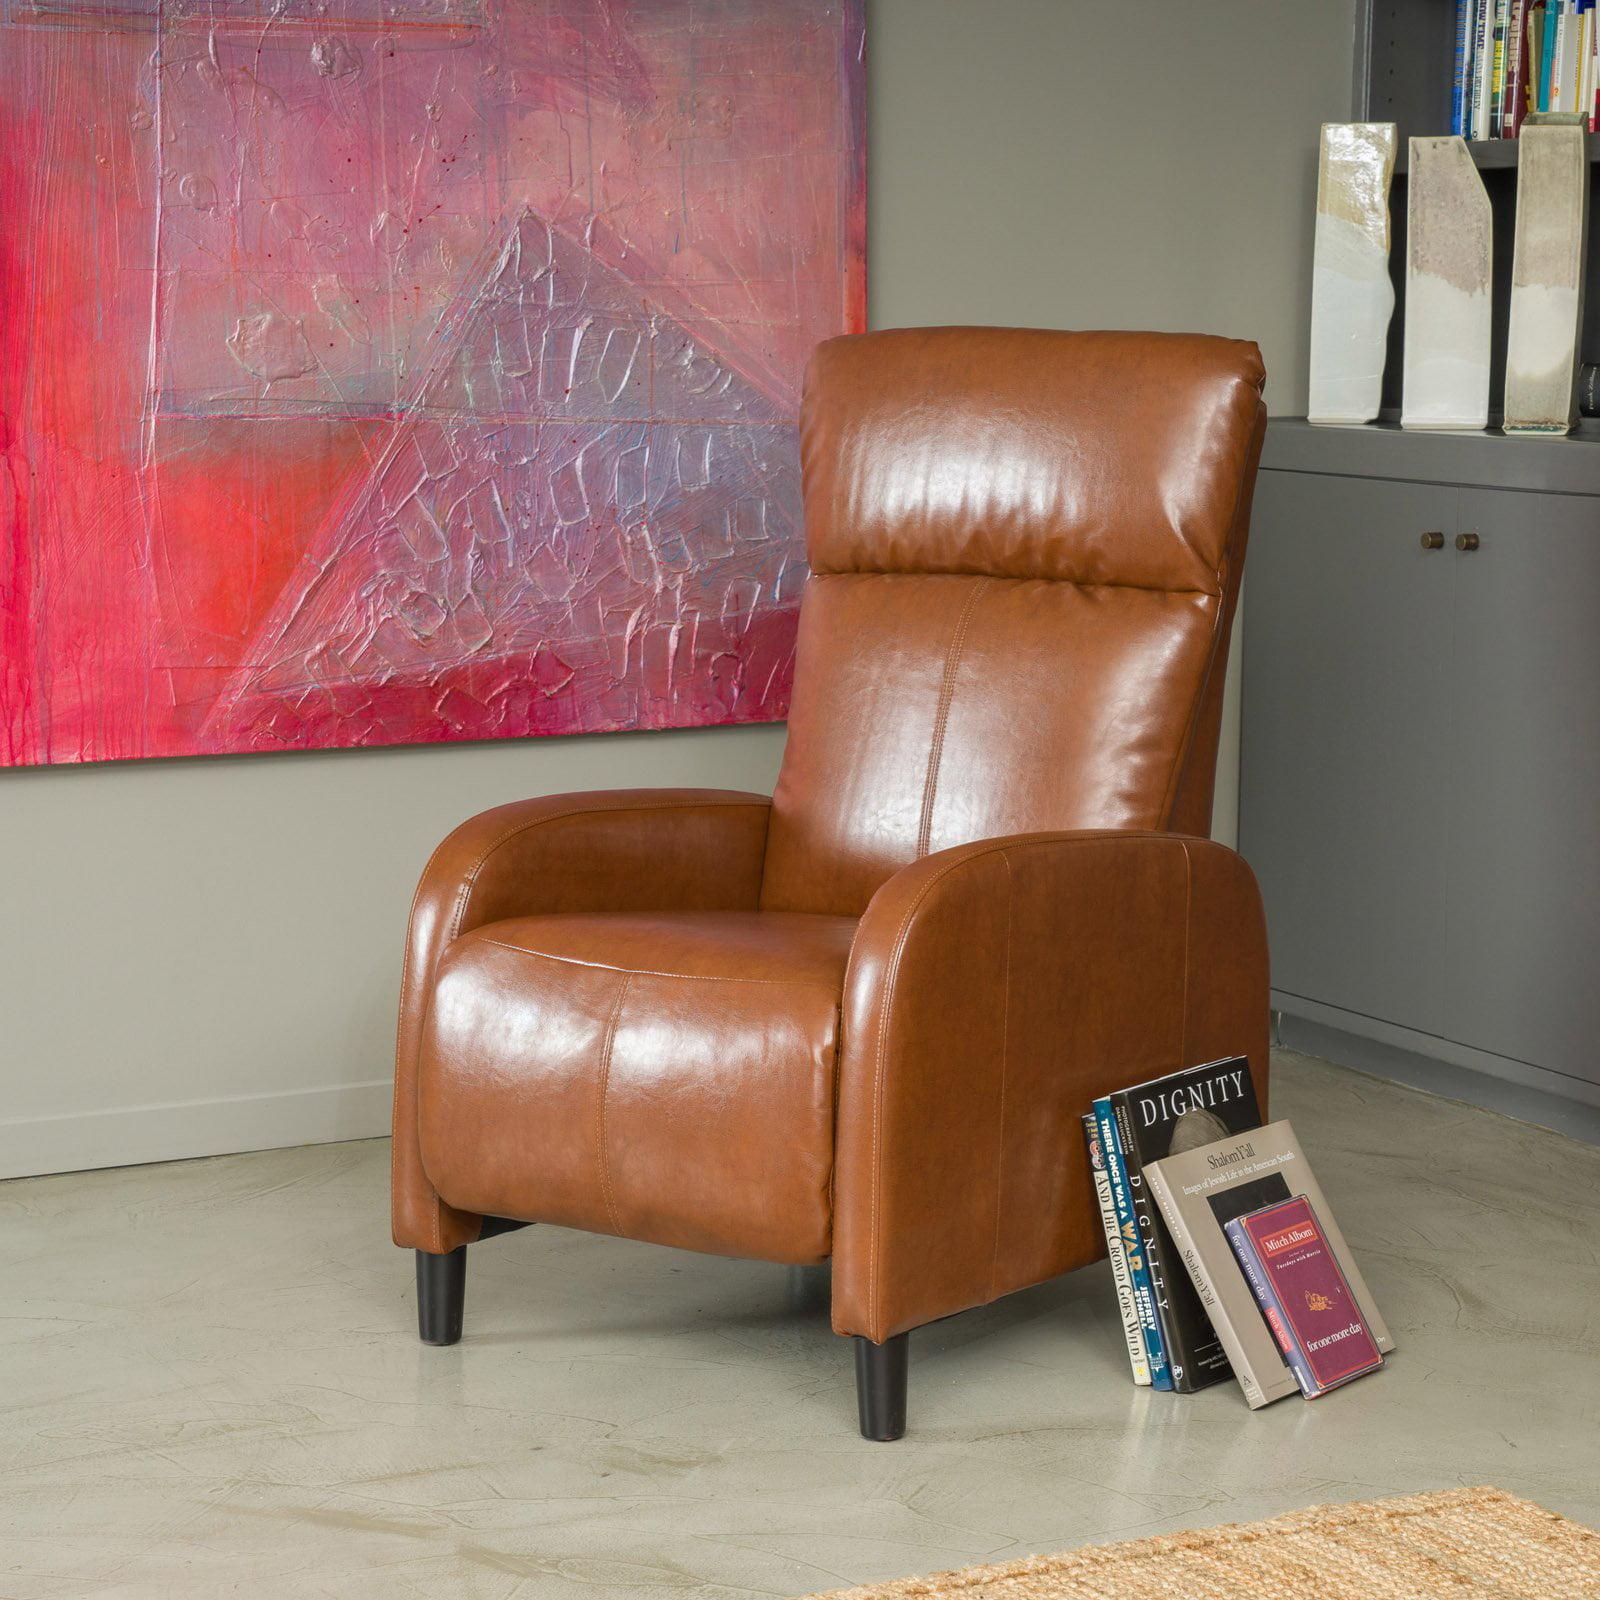 Best Selling Home Decor Furniture Clover Recliner   Walmart.com